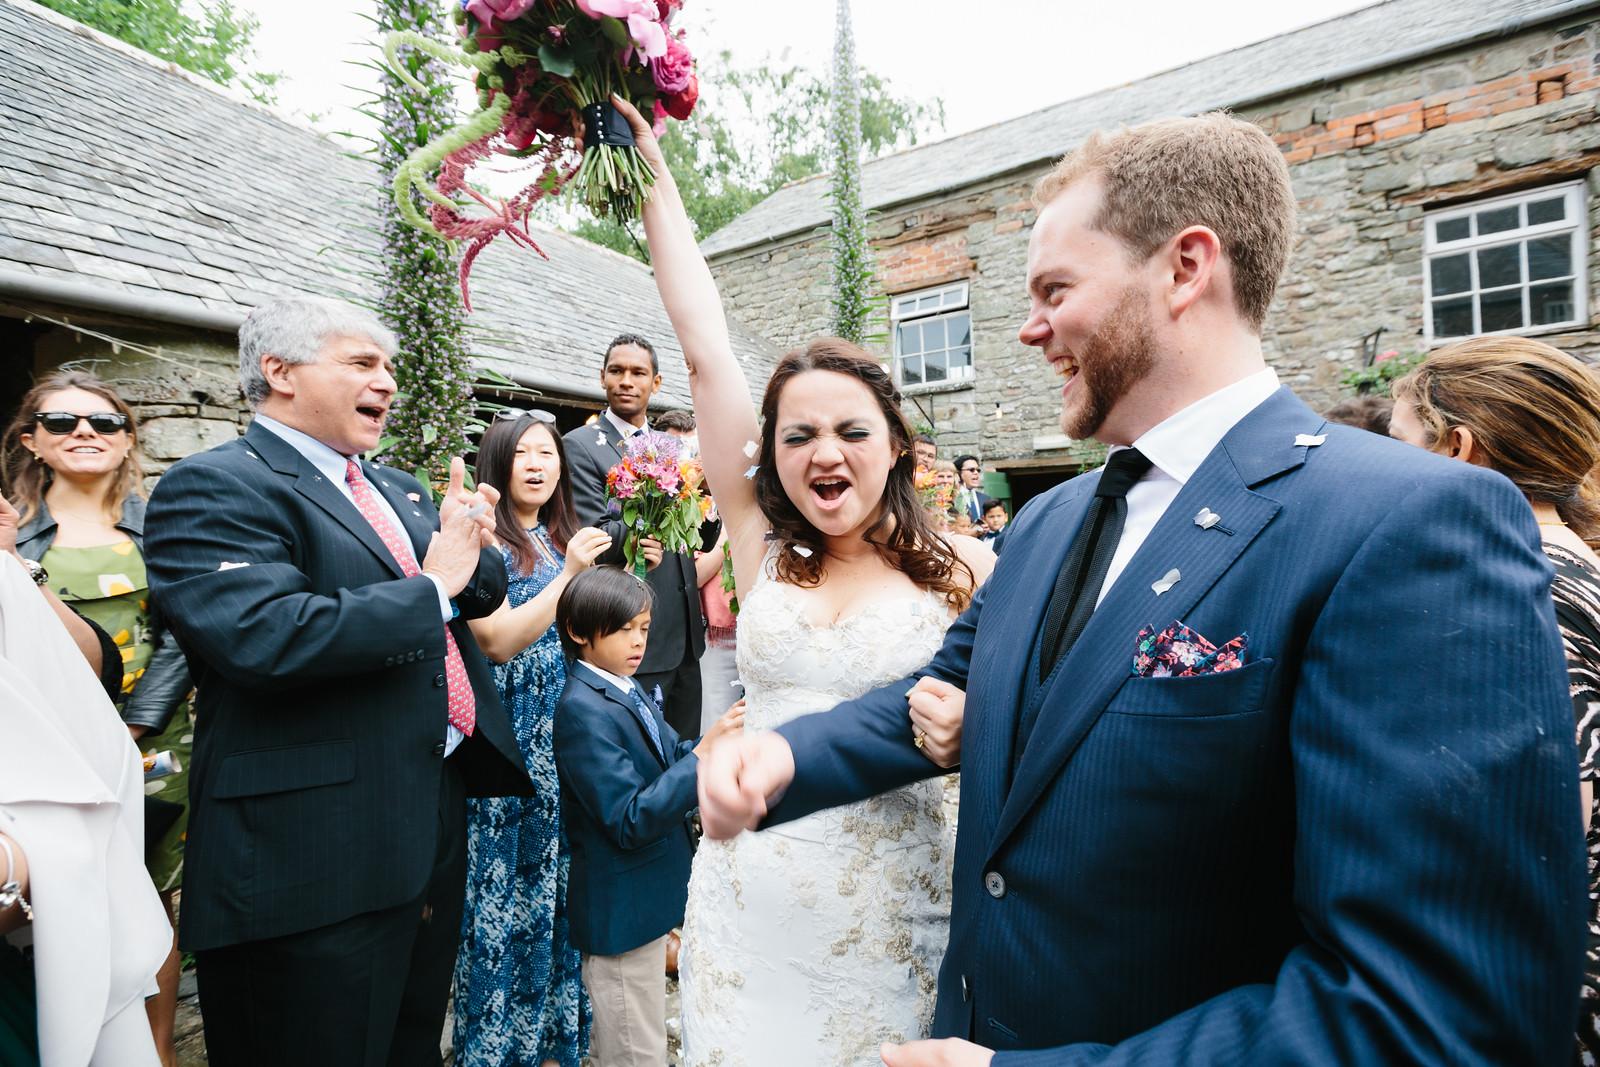 YSABEL&STEFAN-WEDDING-CHRISTINE-WEHRMEIER-252-X3.jpg